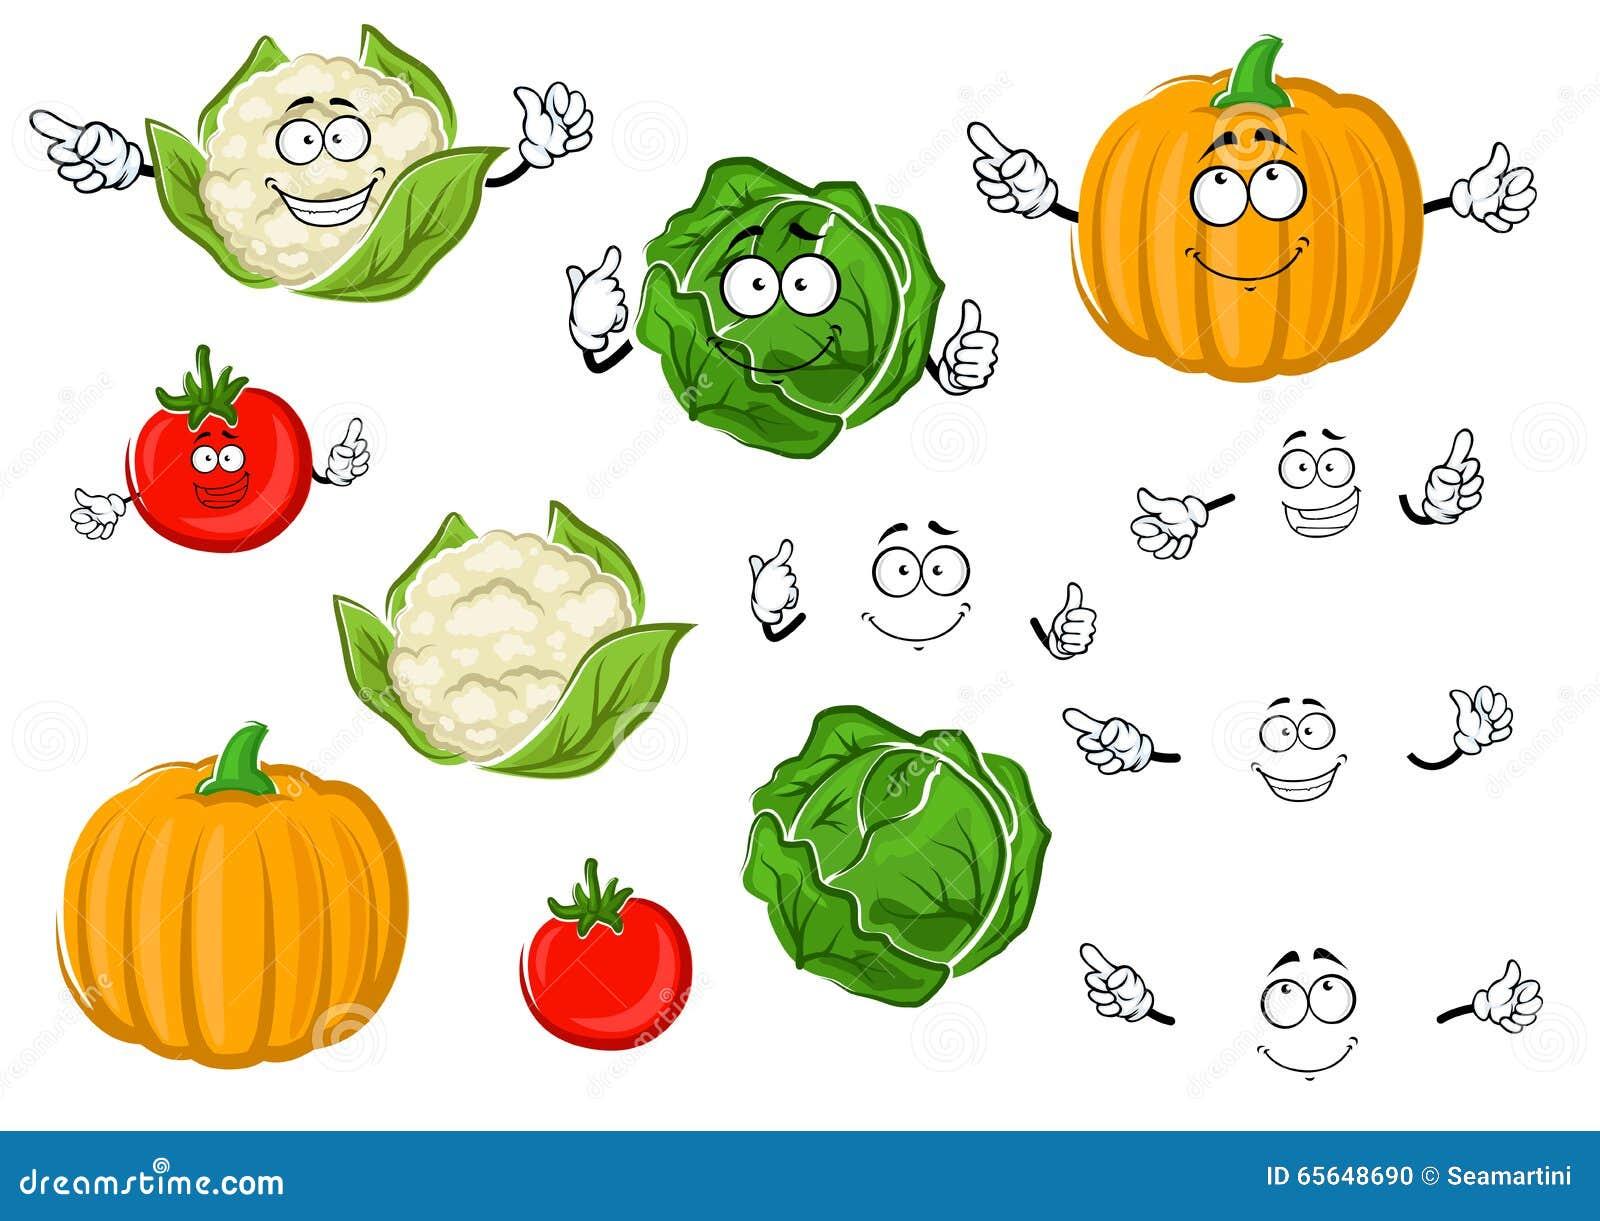 Tomate, chou, potiron et chou-fleur de bande dessinée